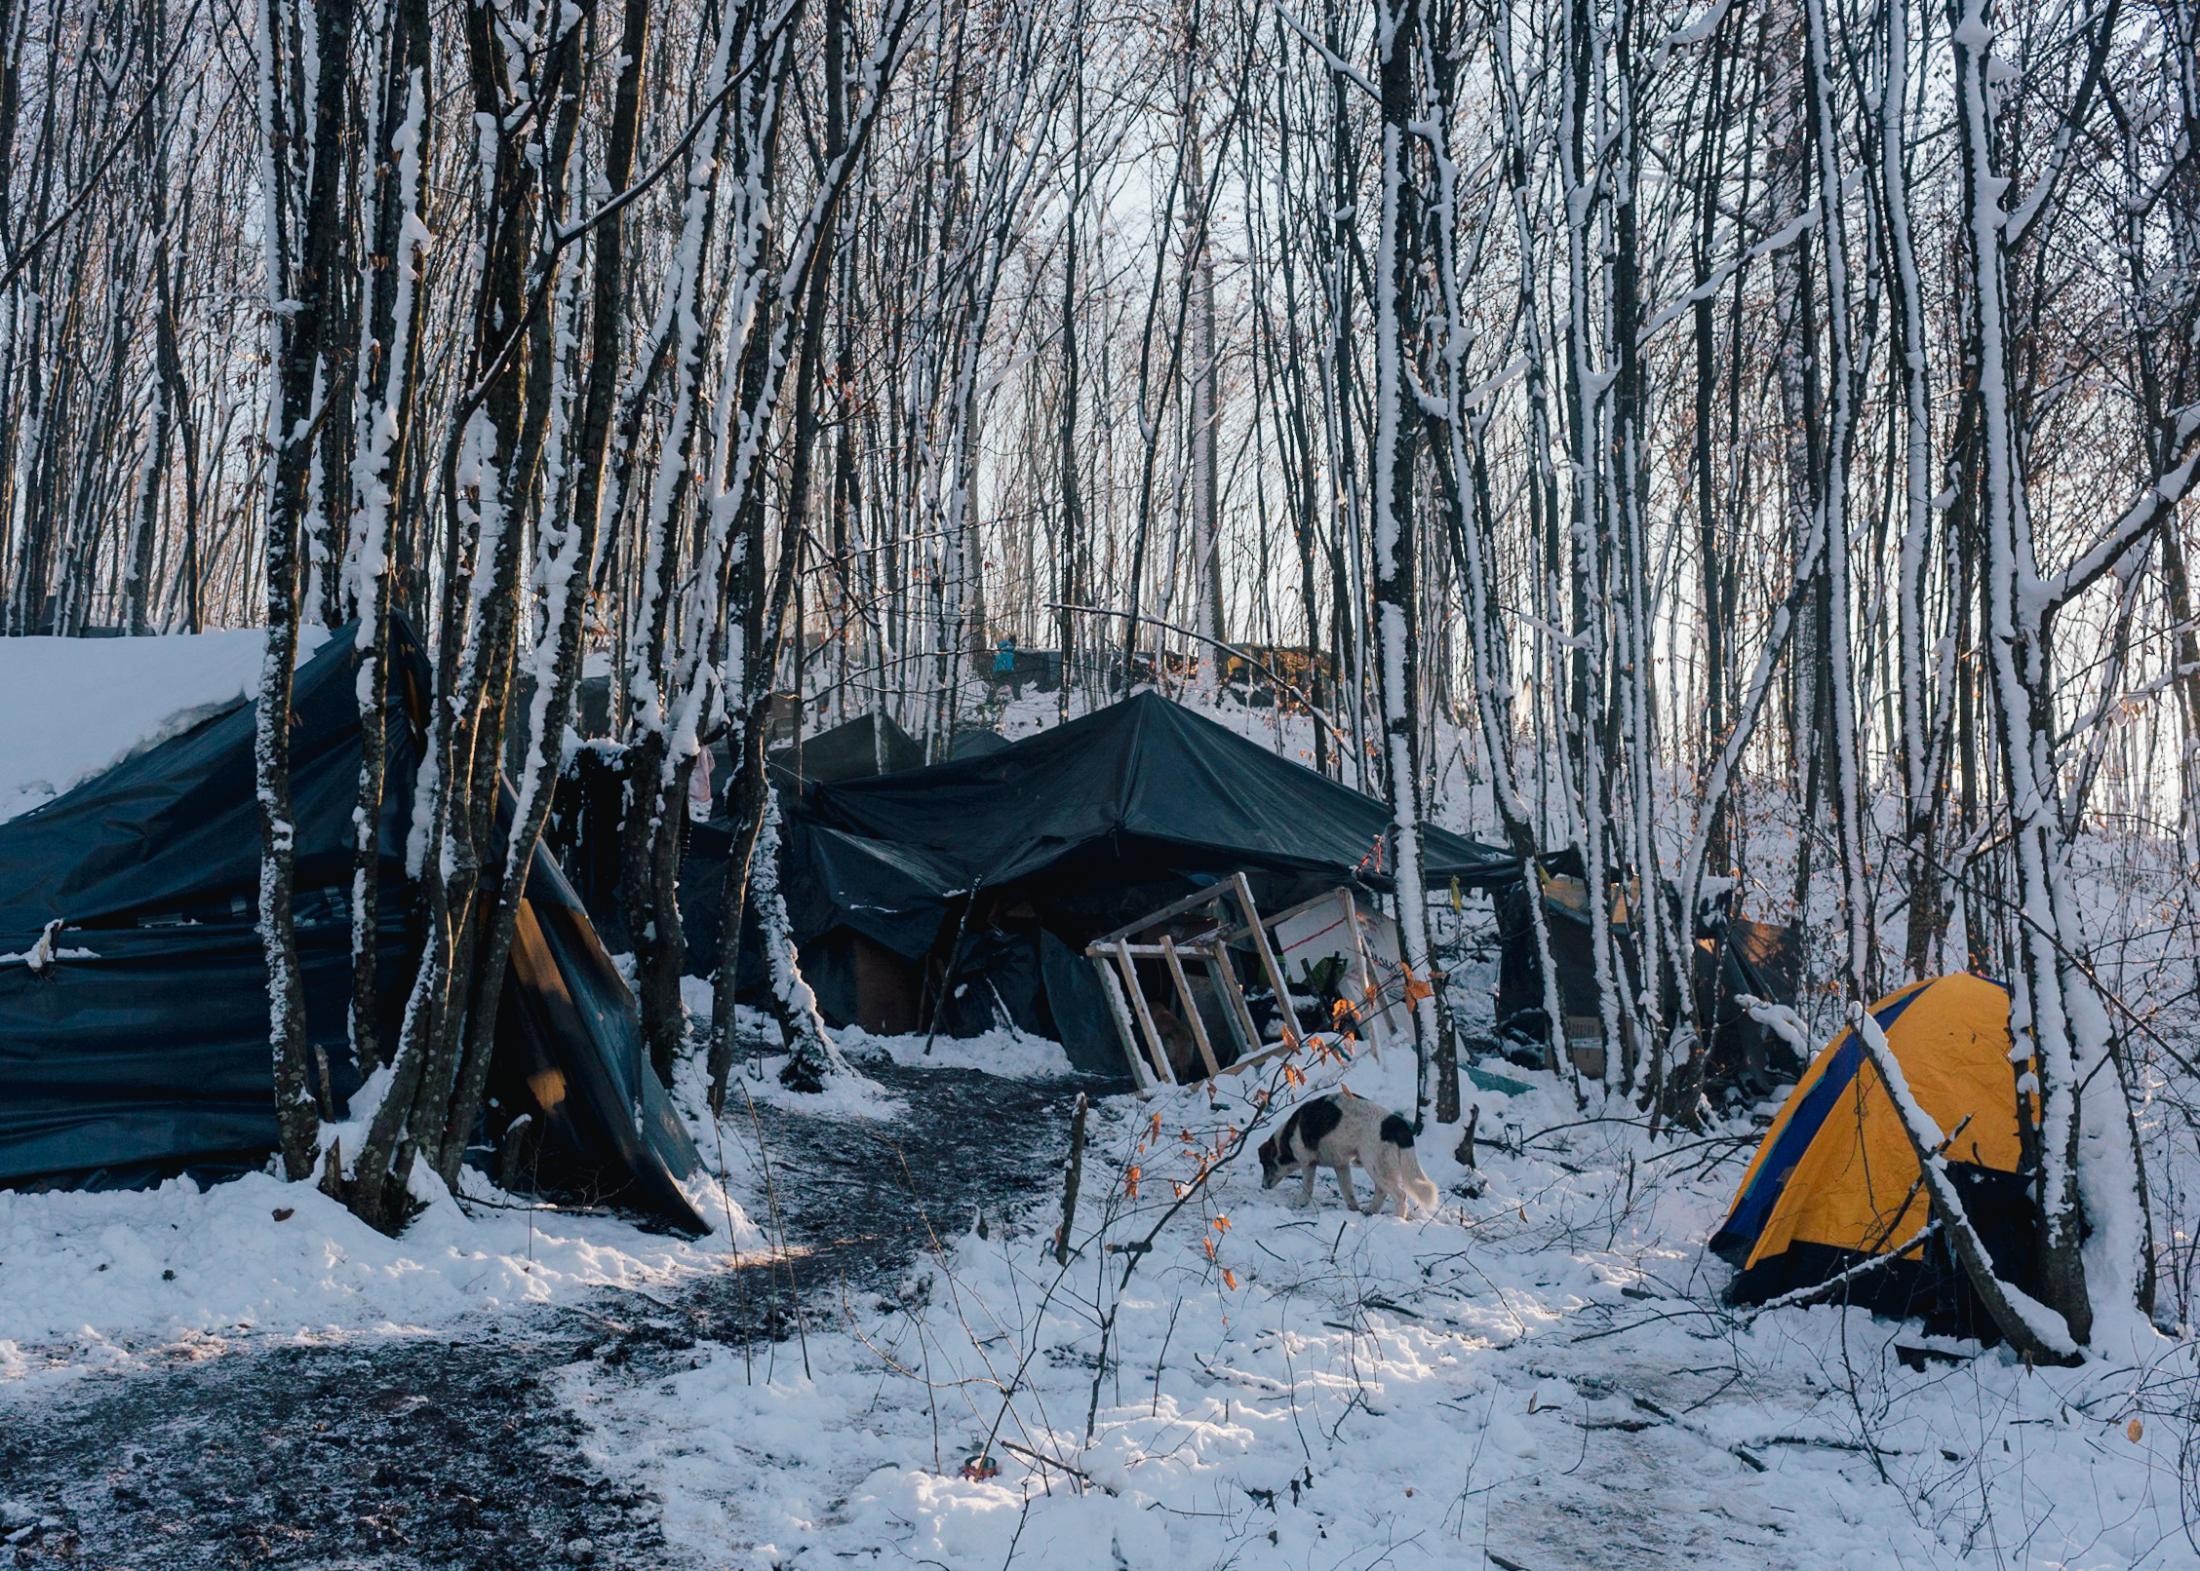 Self-built shelter from bangladeshi migrants close to the city of Velika Kladusa.